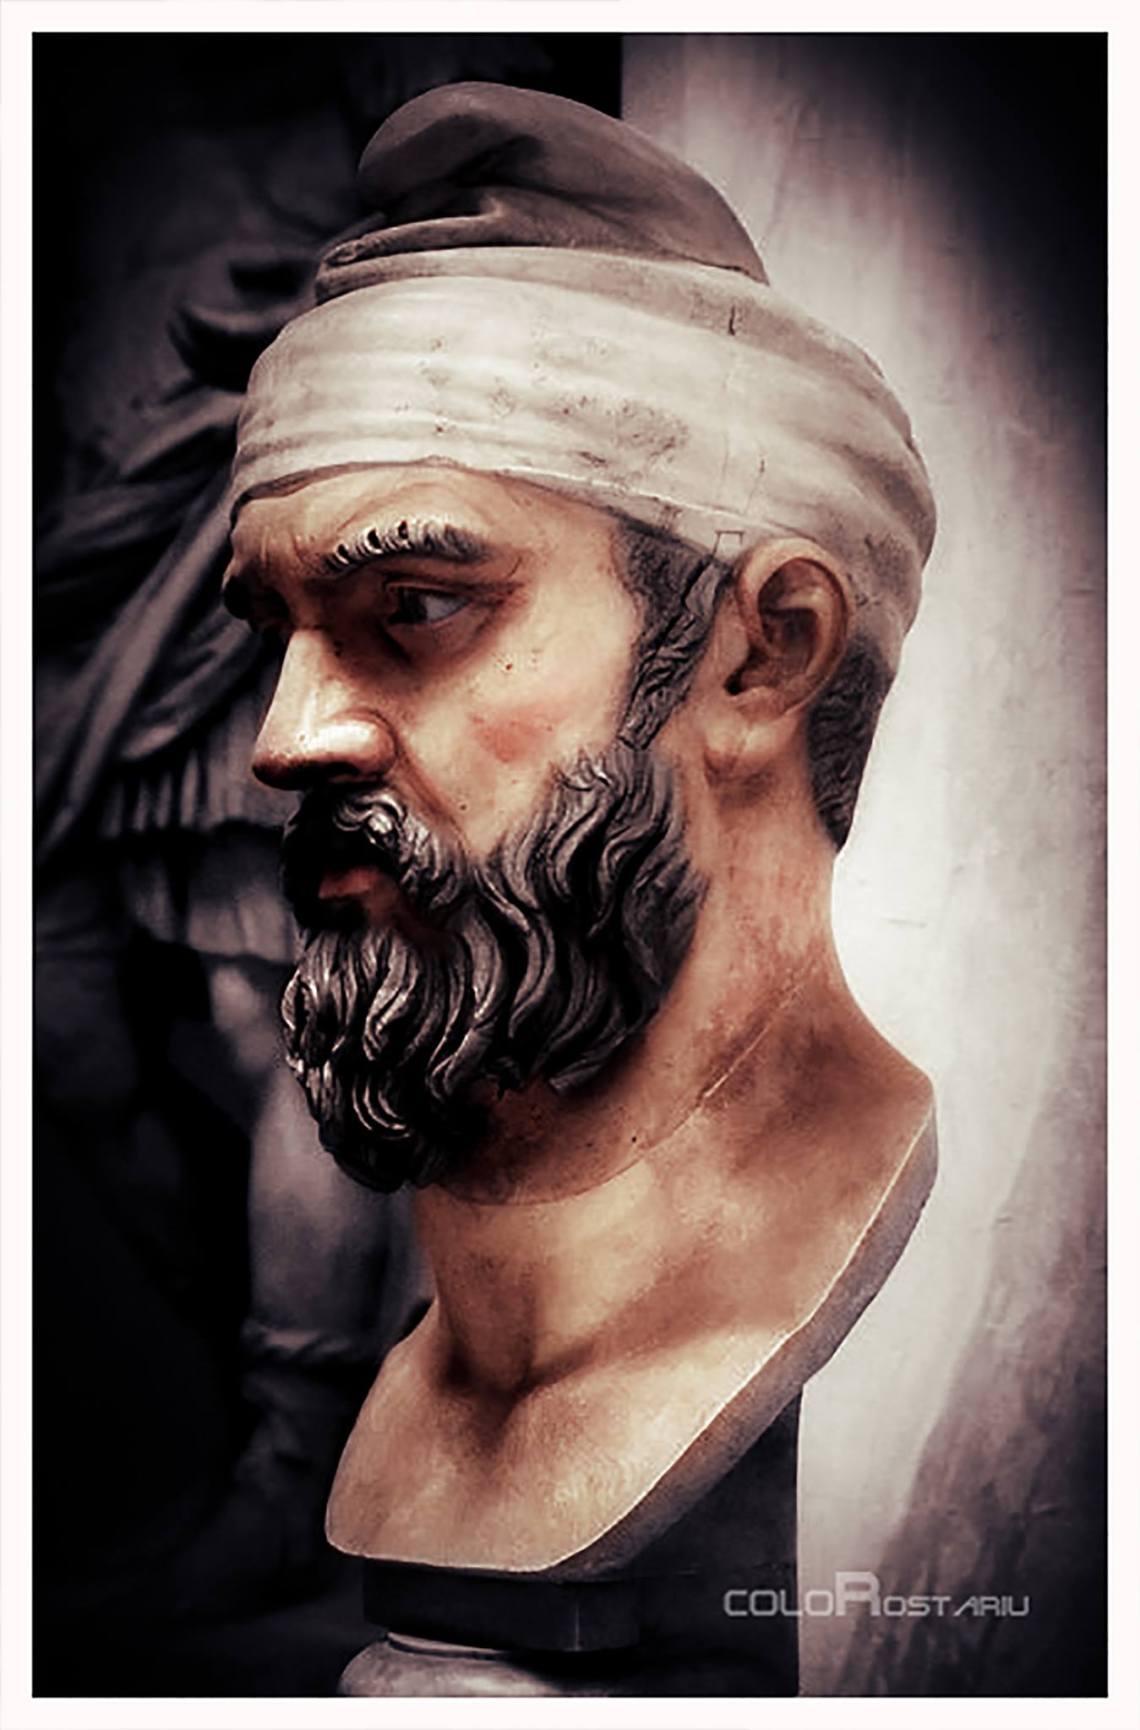 decebal-the-king-of-the-dacians-dacia-regele-dacilor-romania-romanians-vatican.jpg?w=394&h=300